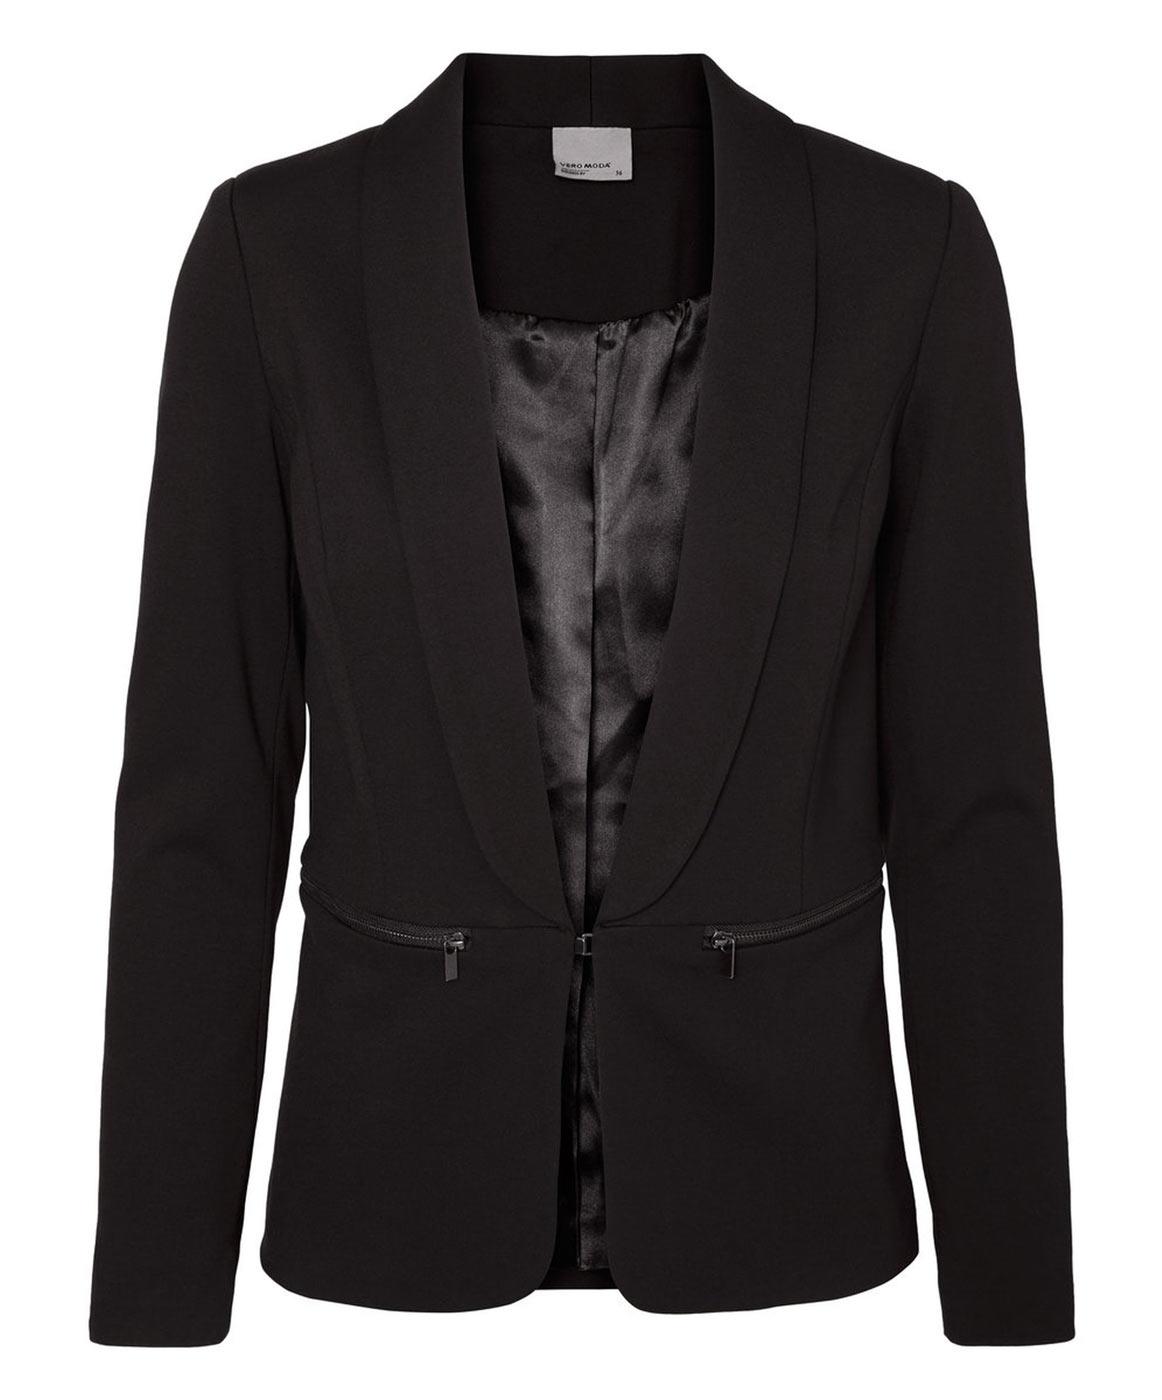 Vero Moda Blazer Regular Fit Mary Blazer in Schwarz